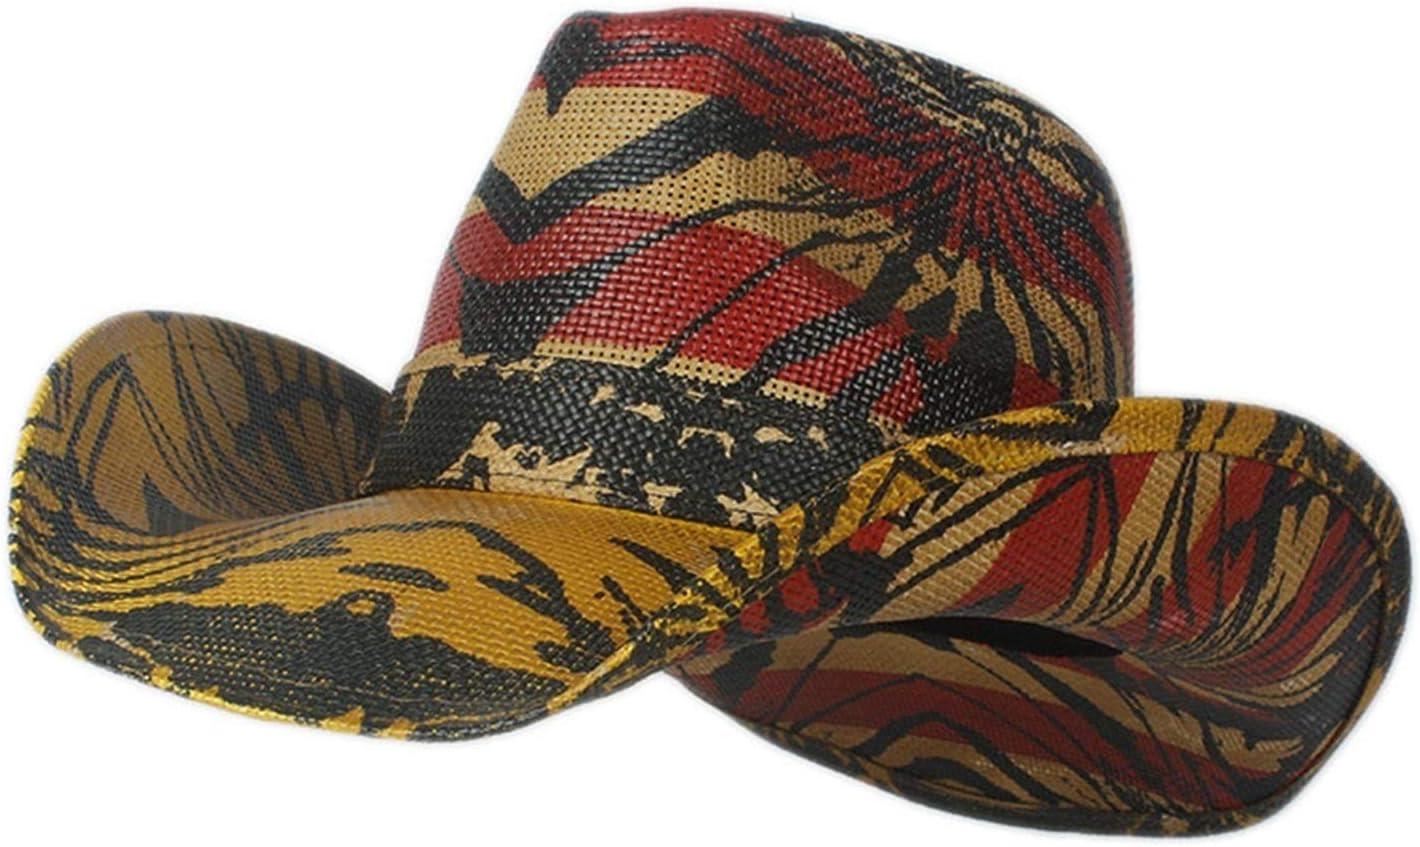 LHZUS Hats Women Men Straw Cowboy Hat Western Cowgirl Hat Sombre